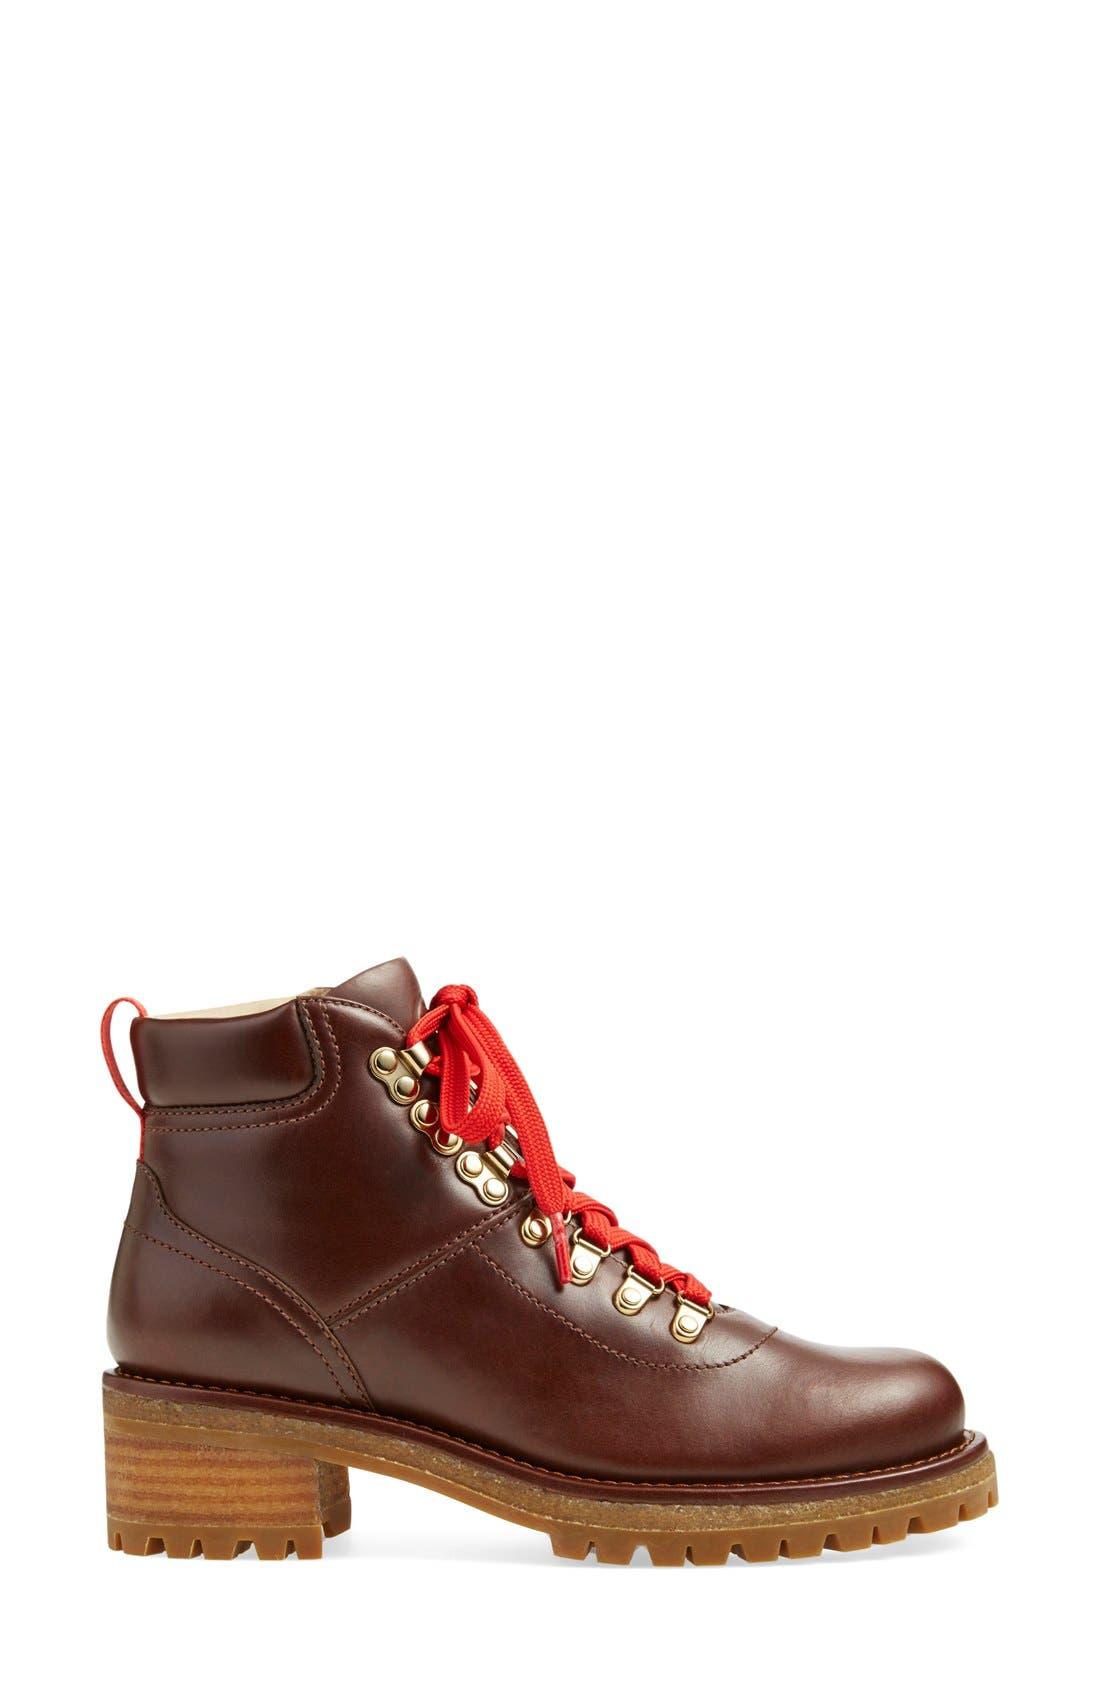 'Gunton' Ankle Hiking Boot,                             Alternate thumbnail 2, color,                             200